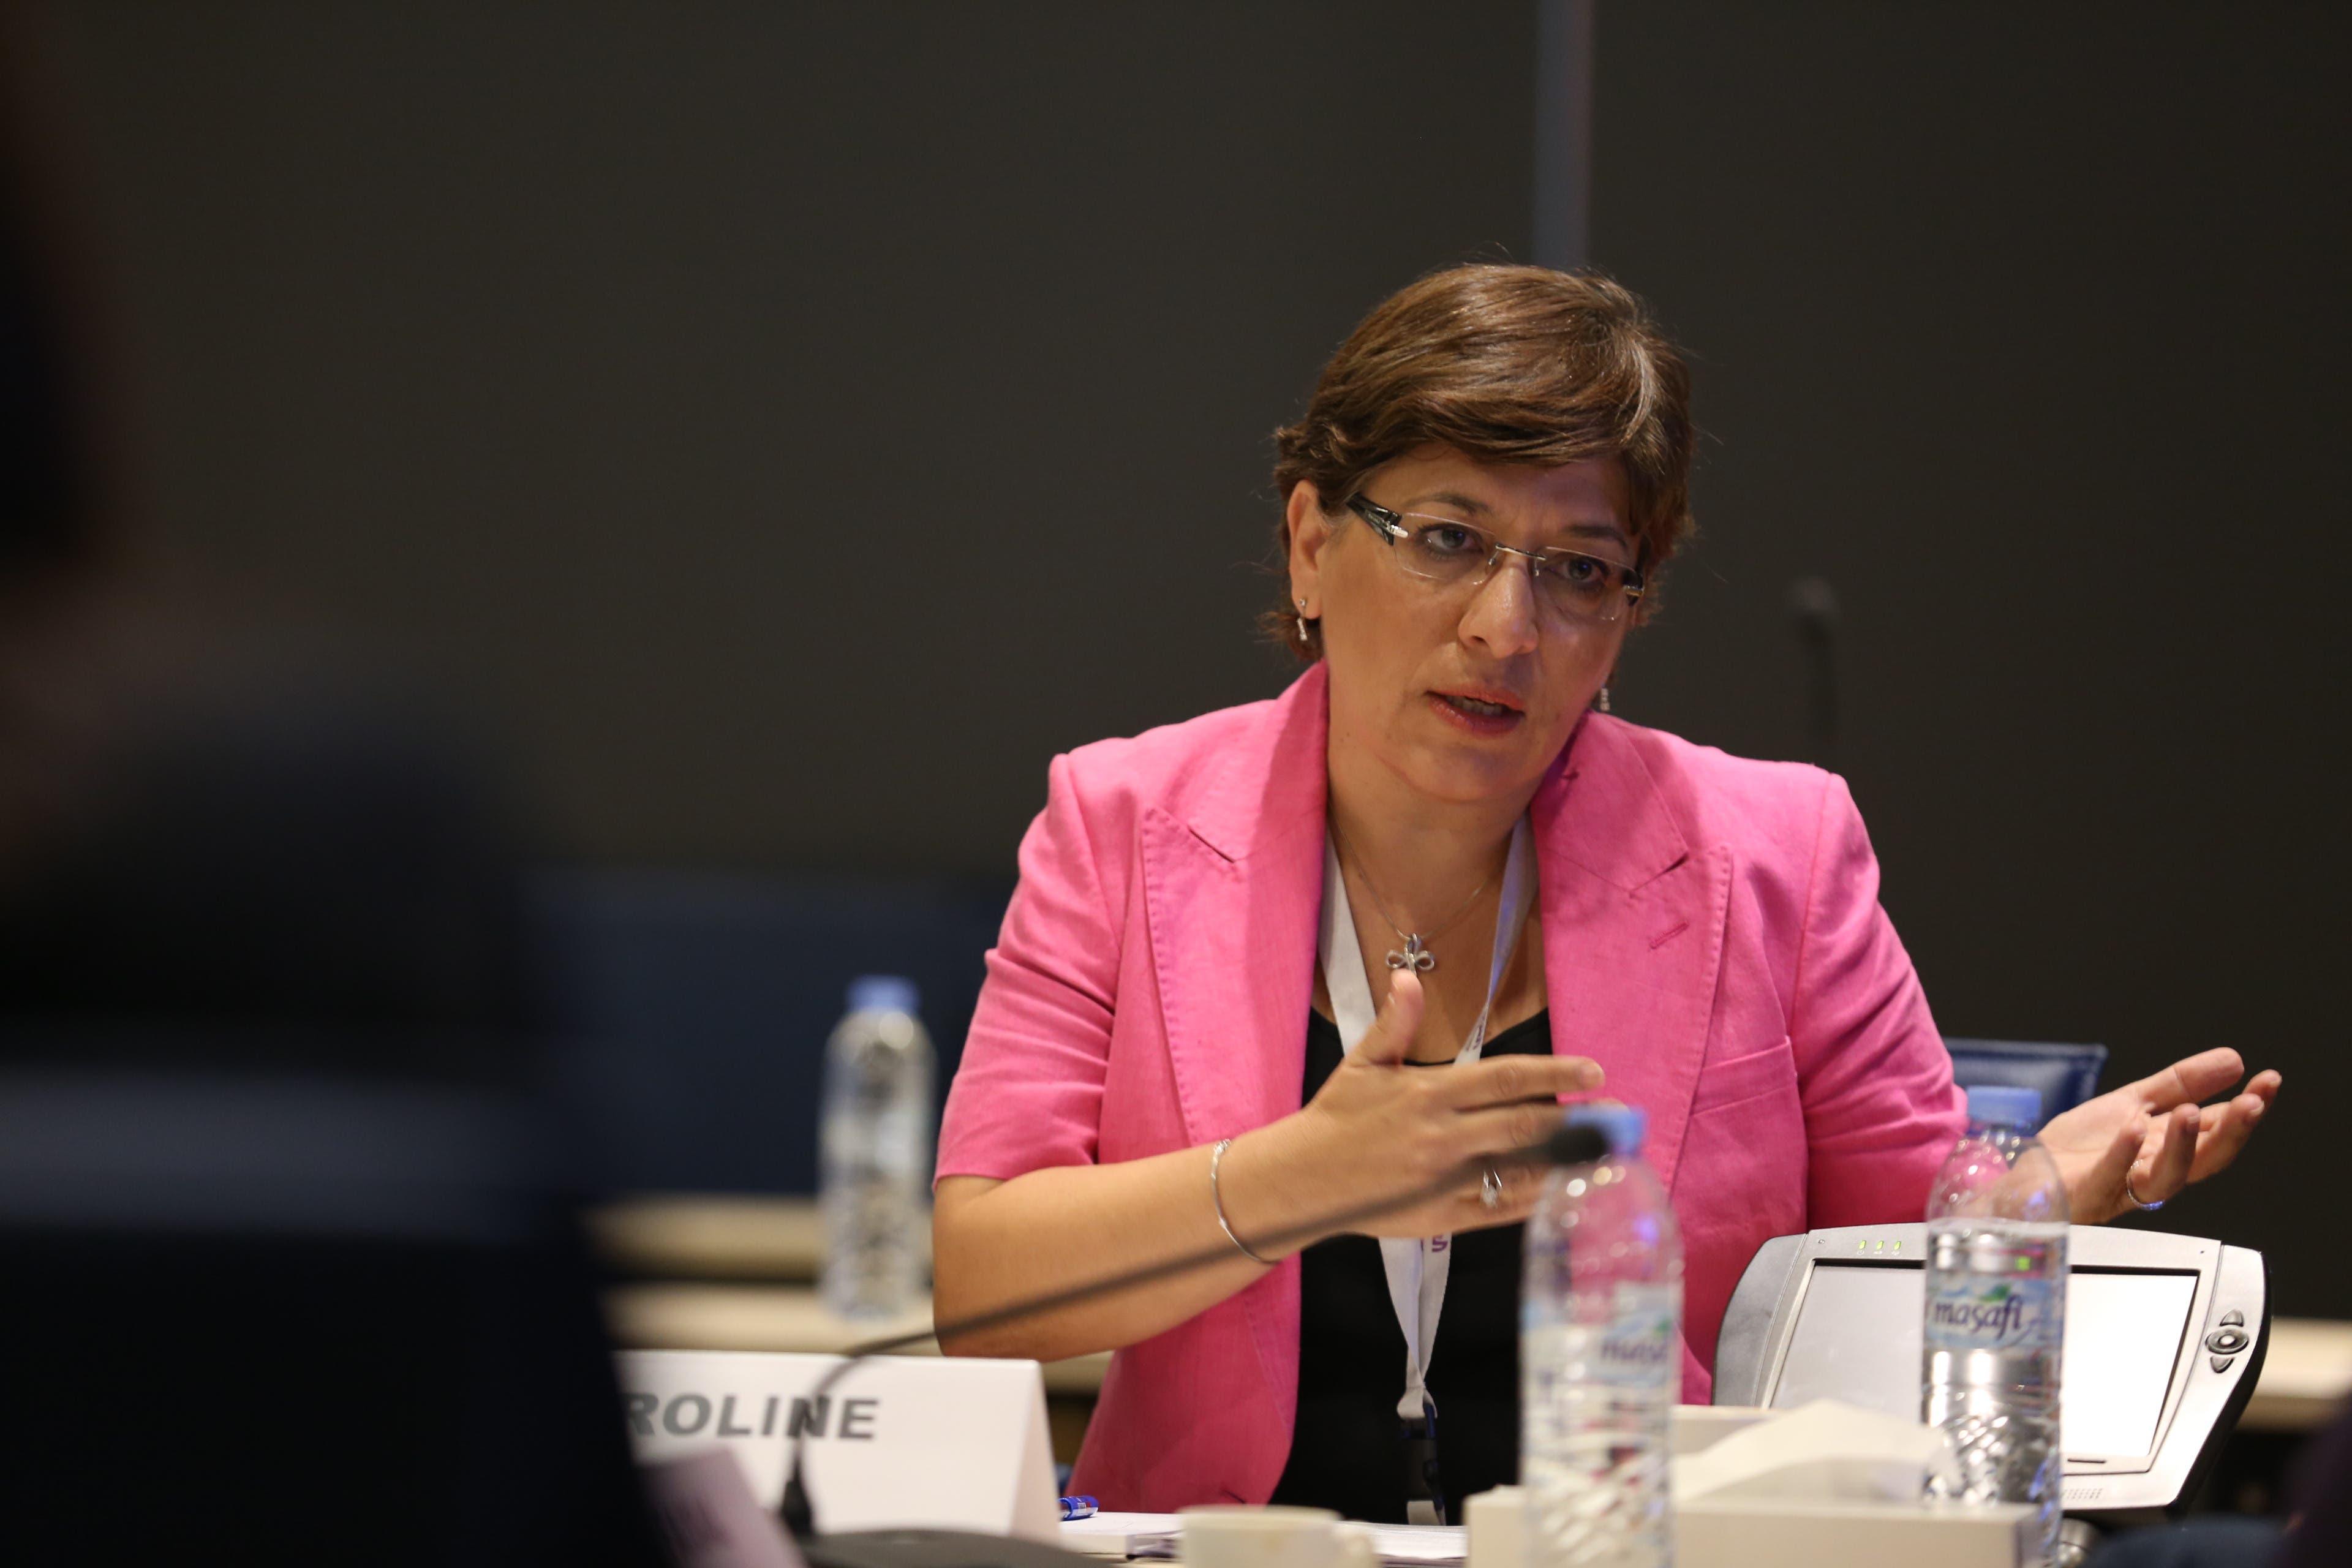 Caroline Faraj, vice president of Arabic services at CNN. (Al Arabiya News)